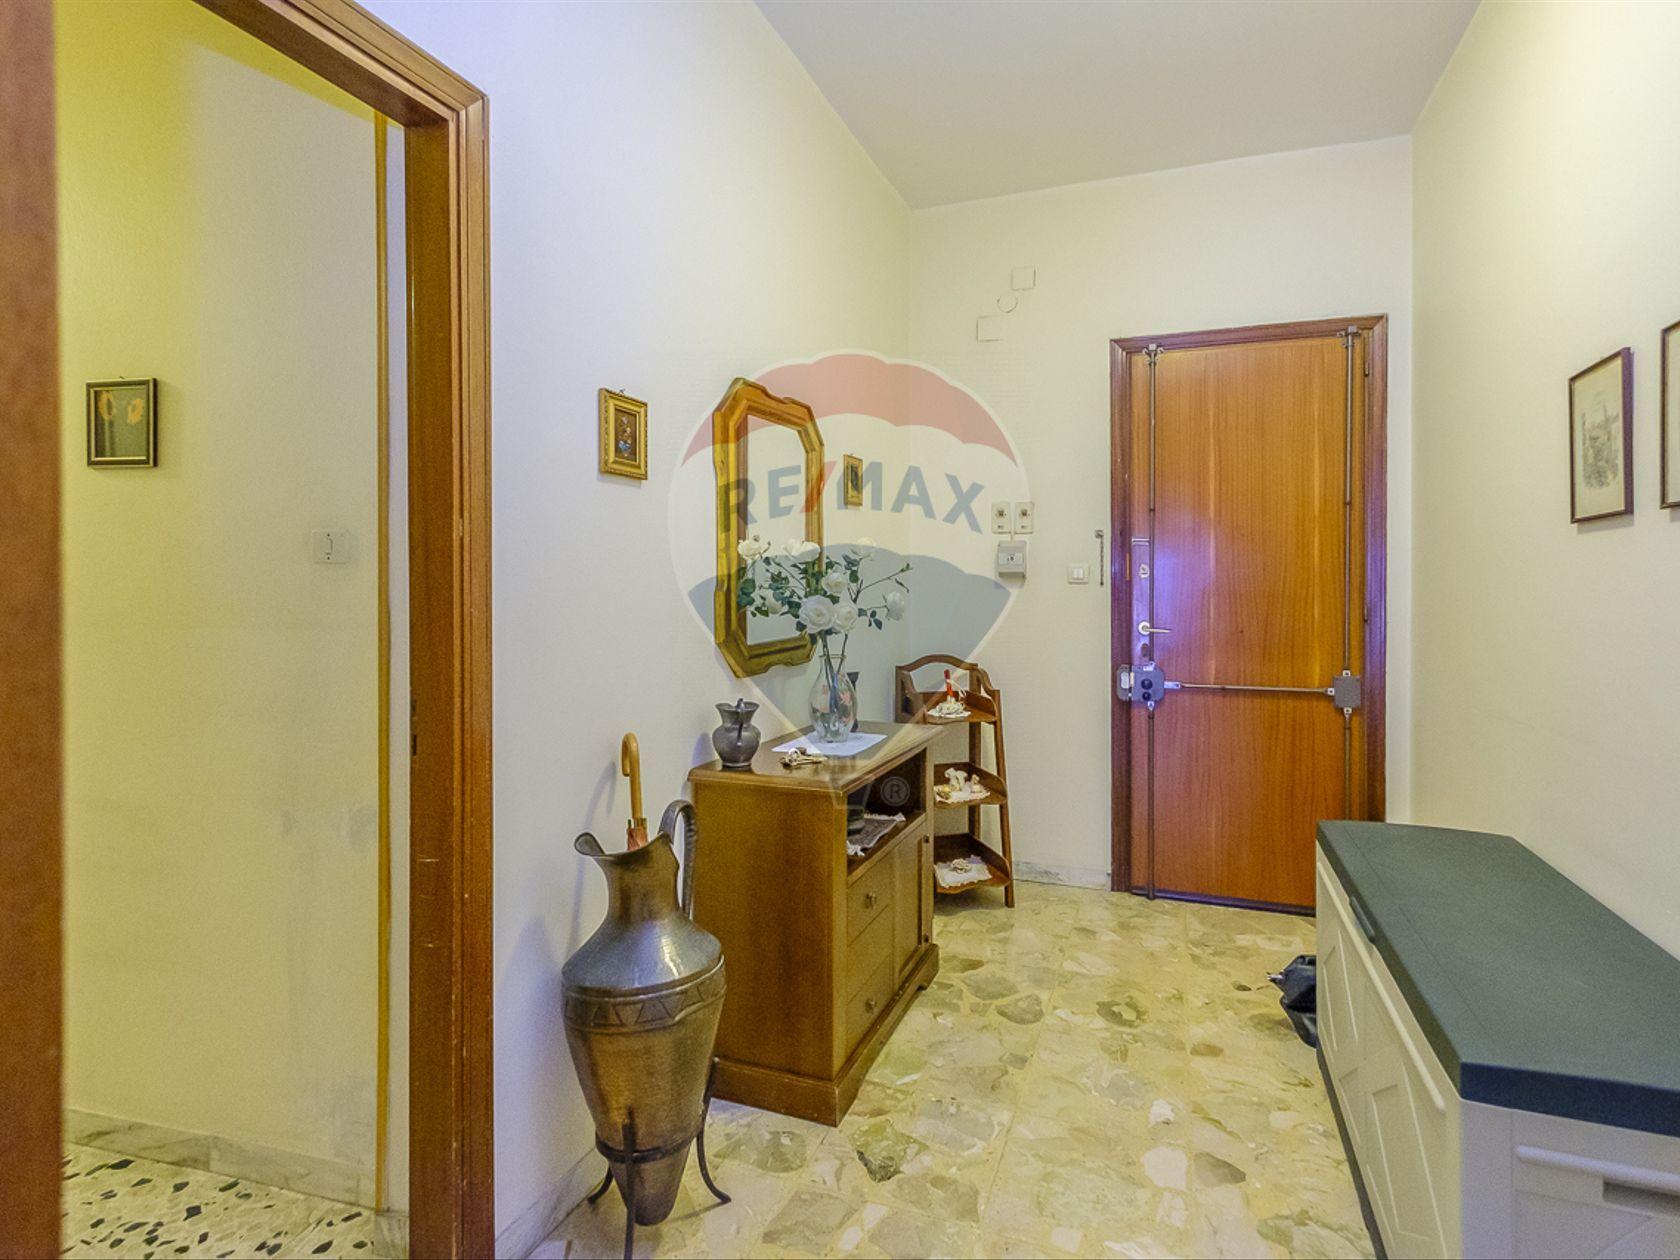 Appartamento Siracusa- Scala Greca S. Panagia Teracati Zecchino, Siracusa, SR Vendita - Foto 23